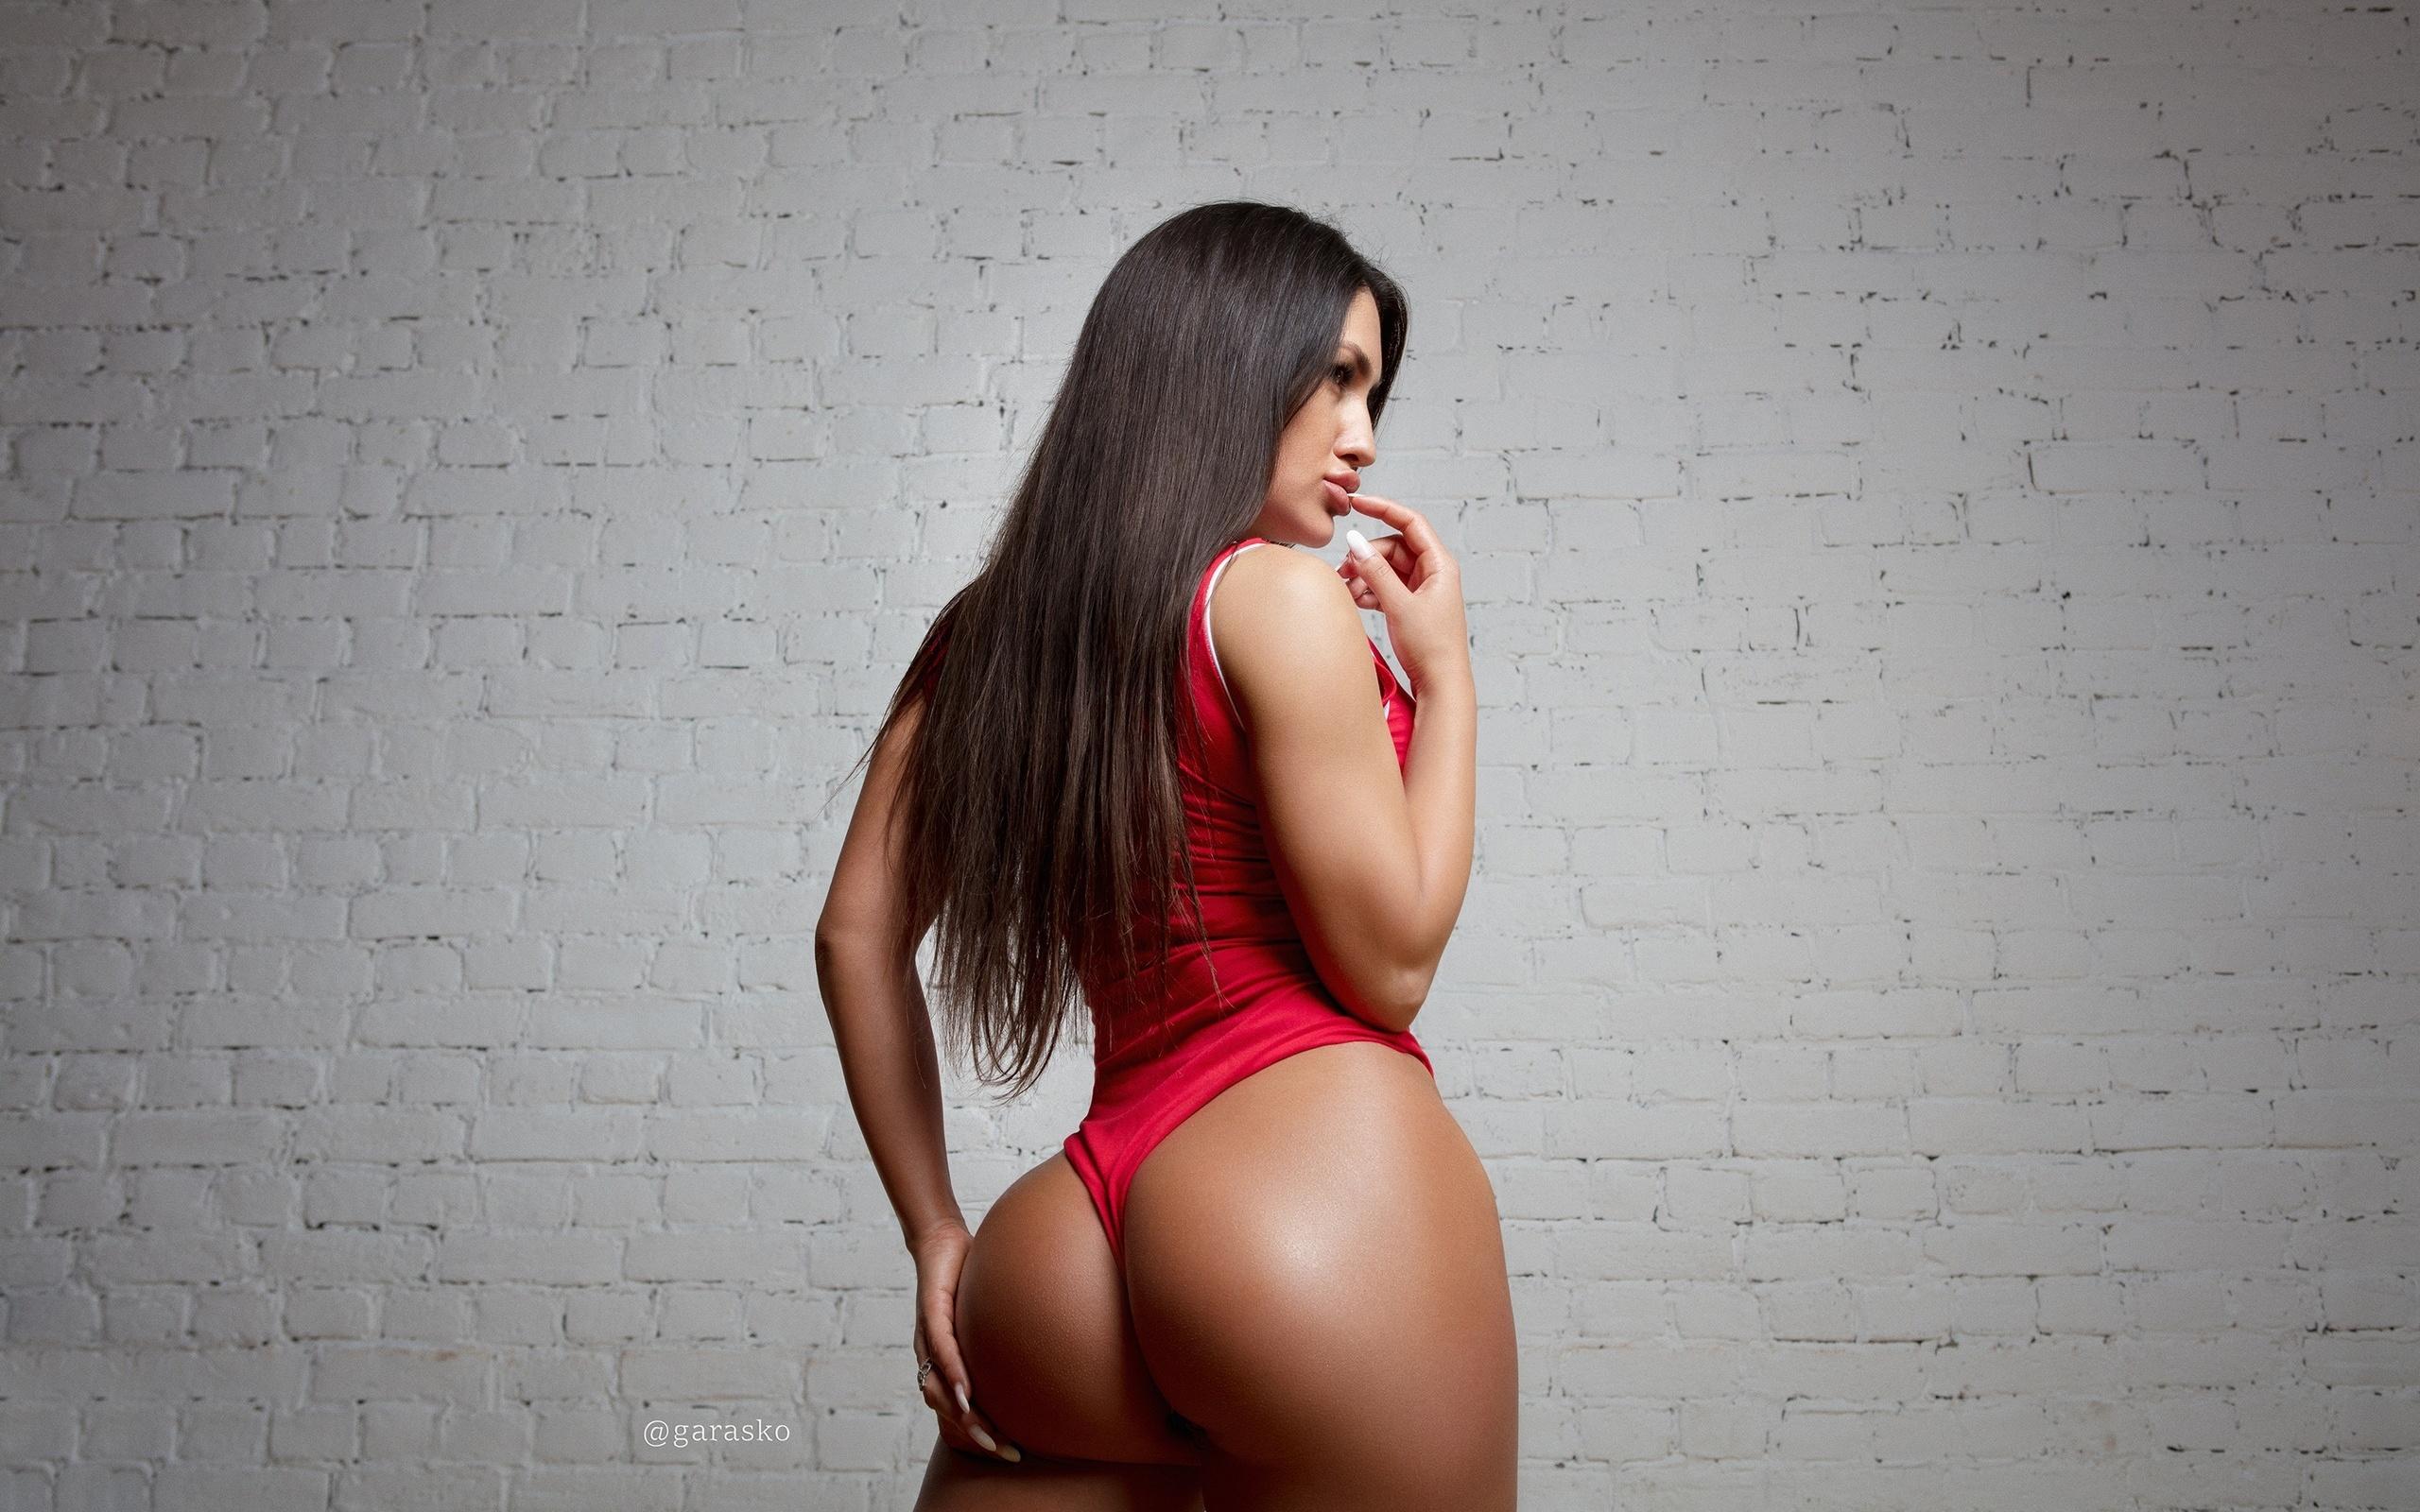 women, pavel garasko, tanned, wall, bricks, monokinis, ass, portrait, long hair, chicago bulls, finger on lips, hands on ass, ну и жопа!, жопа, пердень